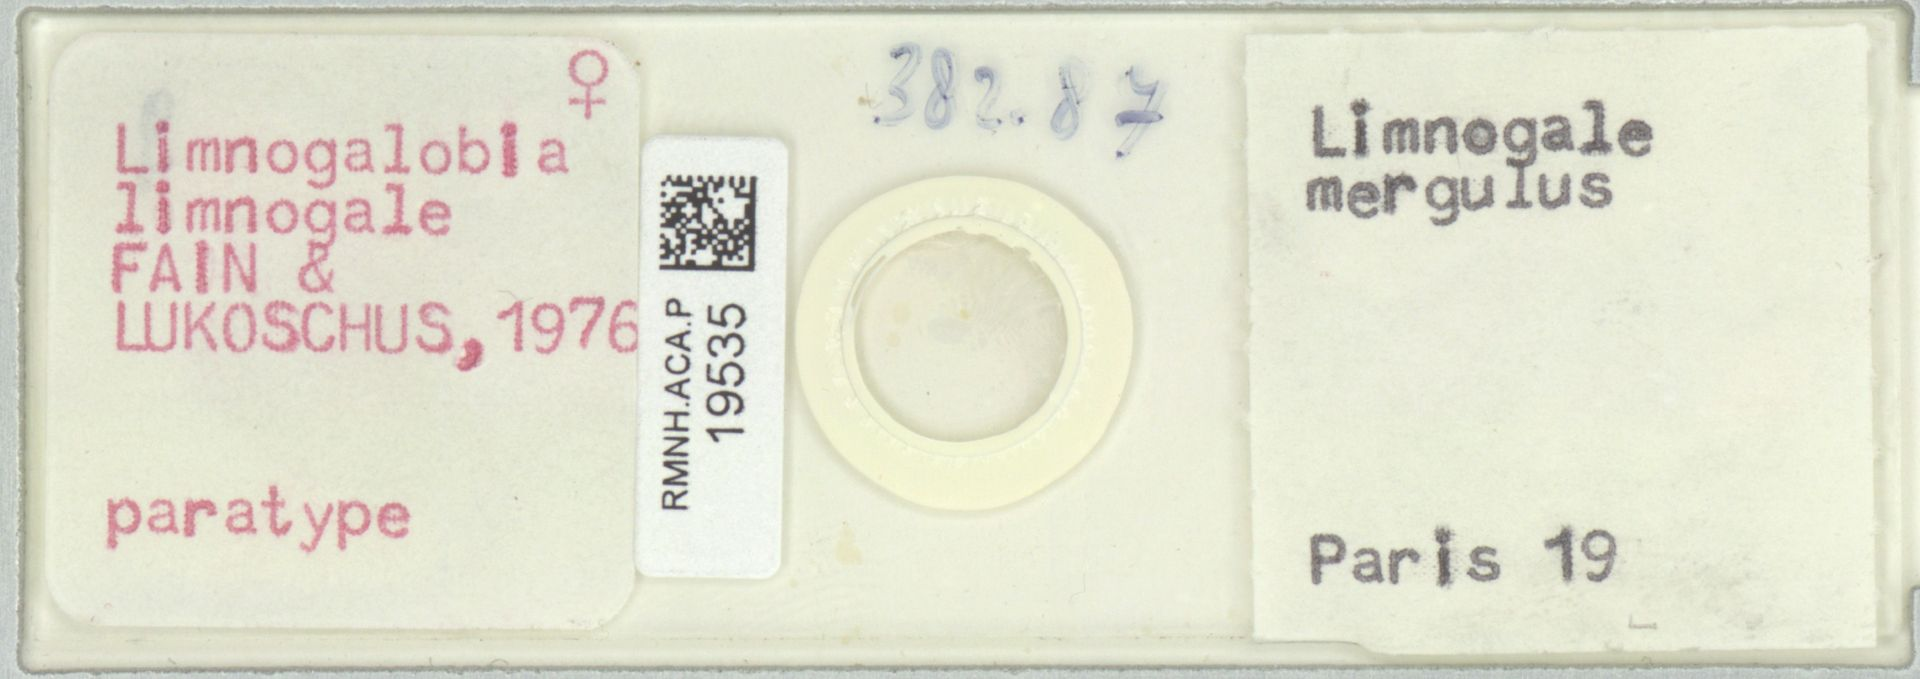 RMNH.ACA.P.19535 | Limnogalobia limnogale